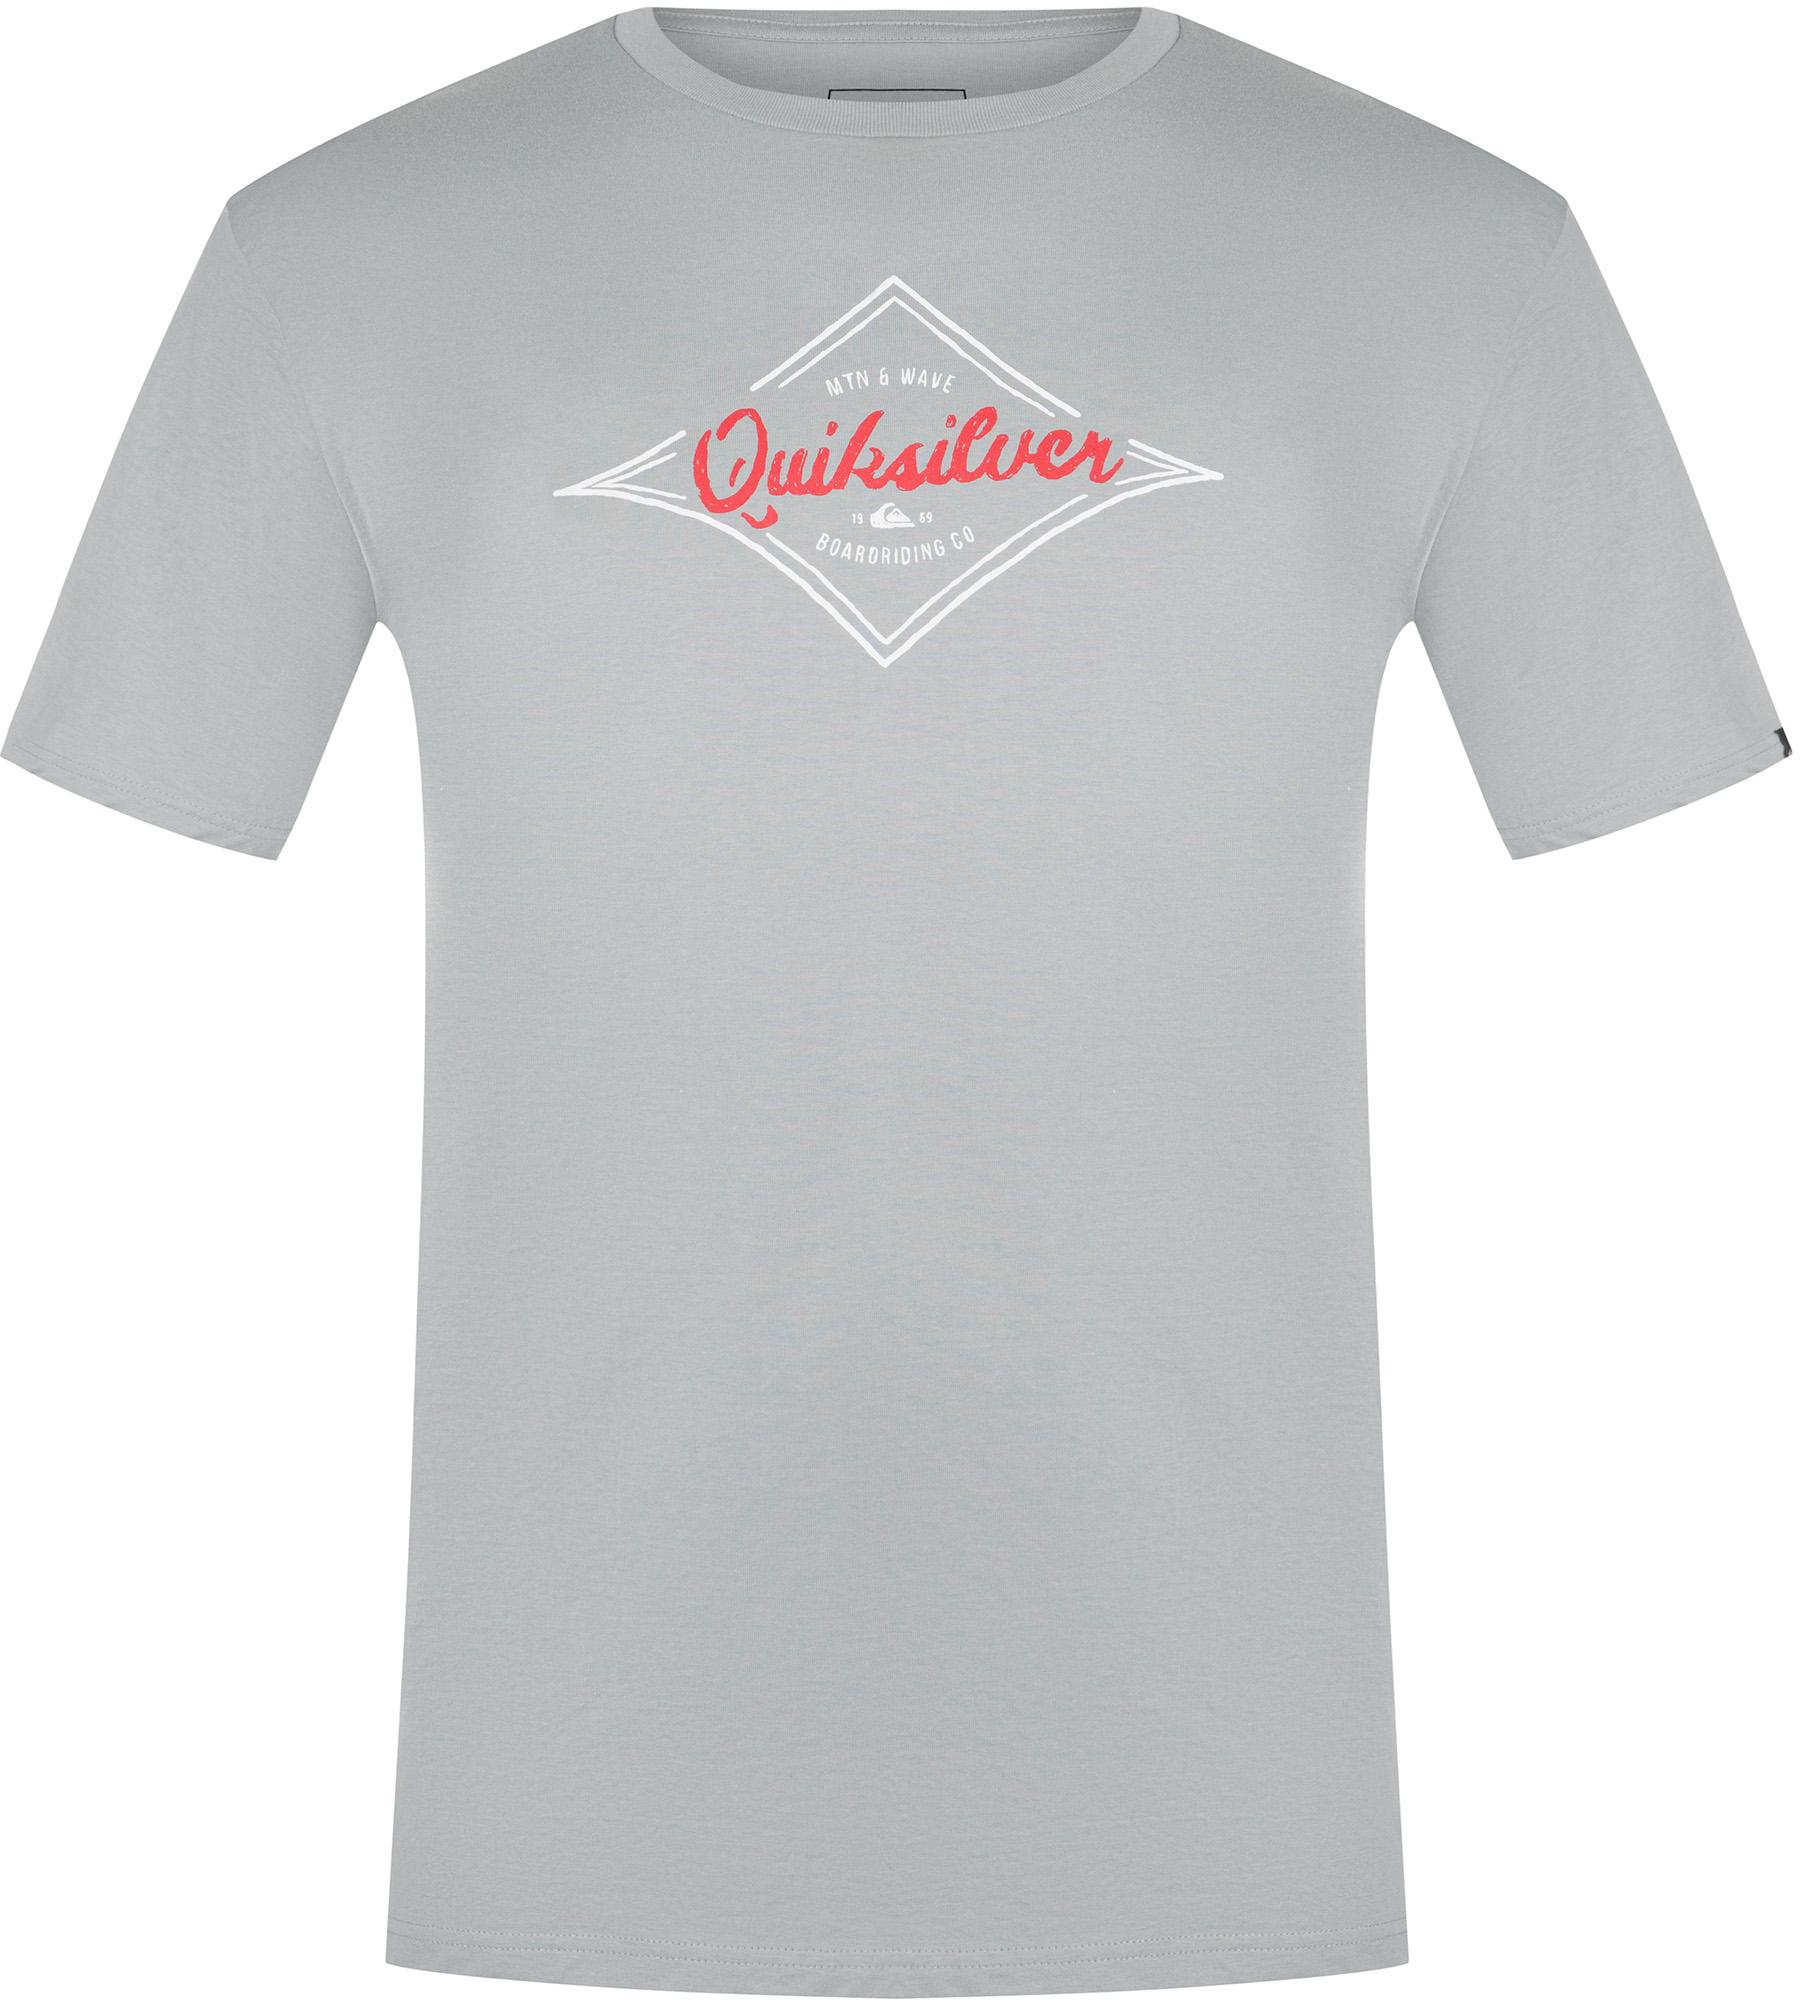 цена на Quiksilver Футболка мужская Quiksilver Flaxton, размер 48-50